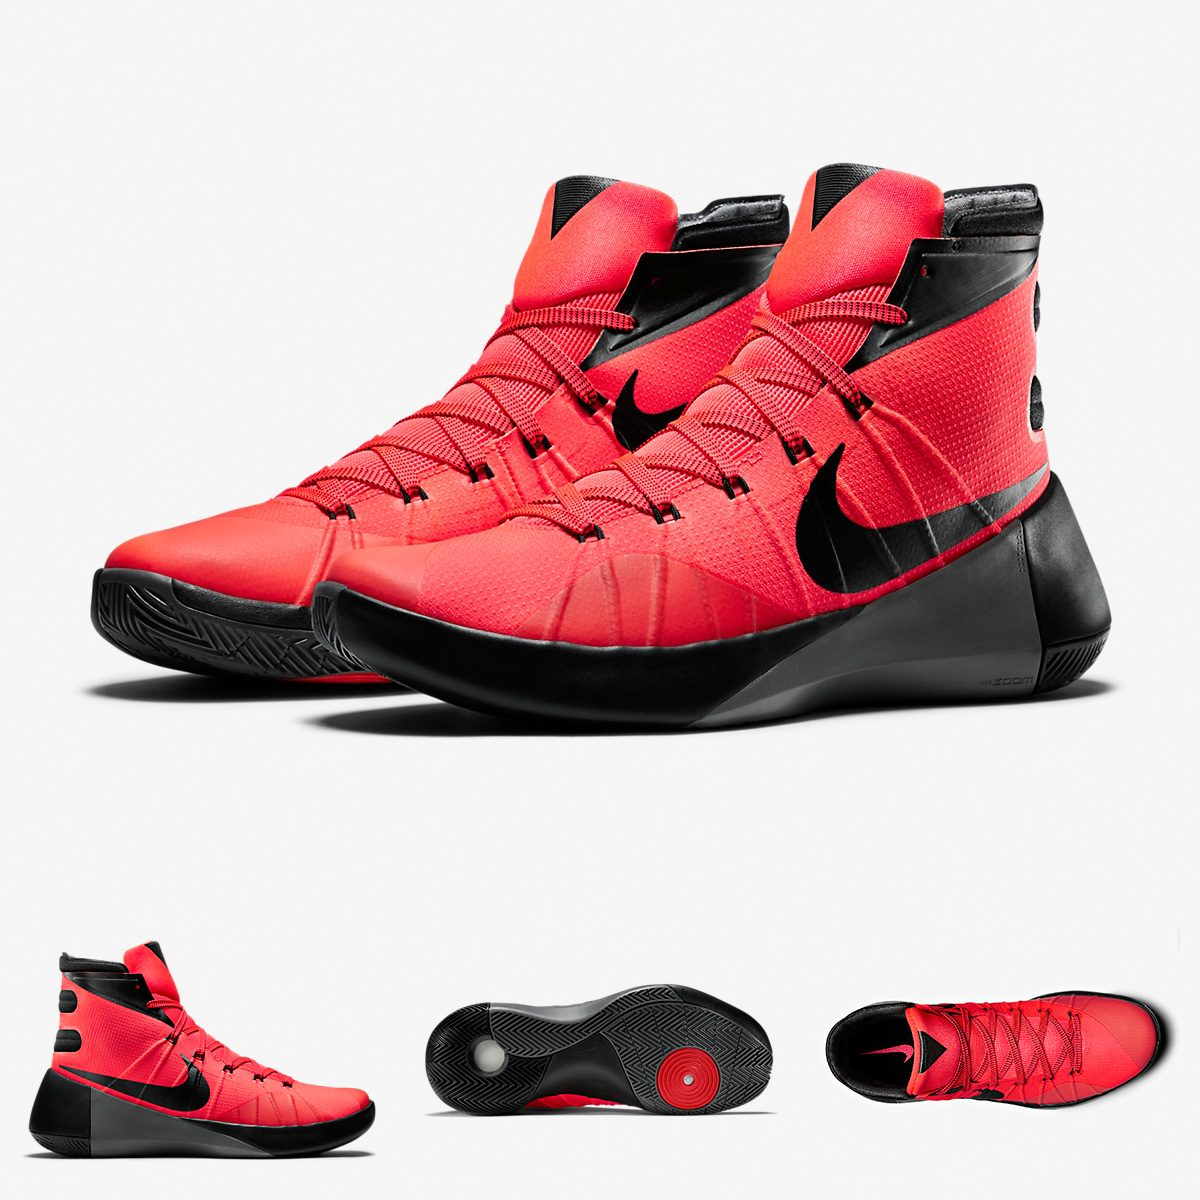 detailed look 3cd07 6aec4 zapatillas nike hyperdunk 2015   rojo negro bright crimson. Cargando zoom.